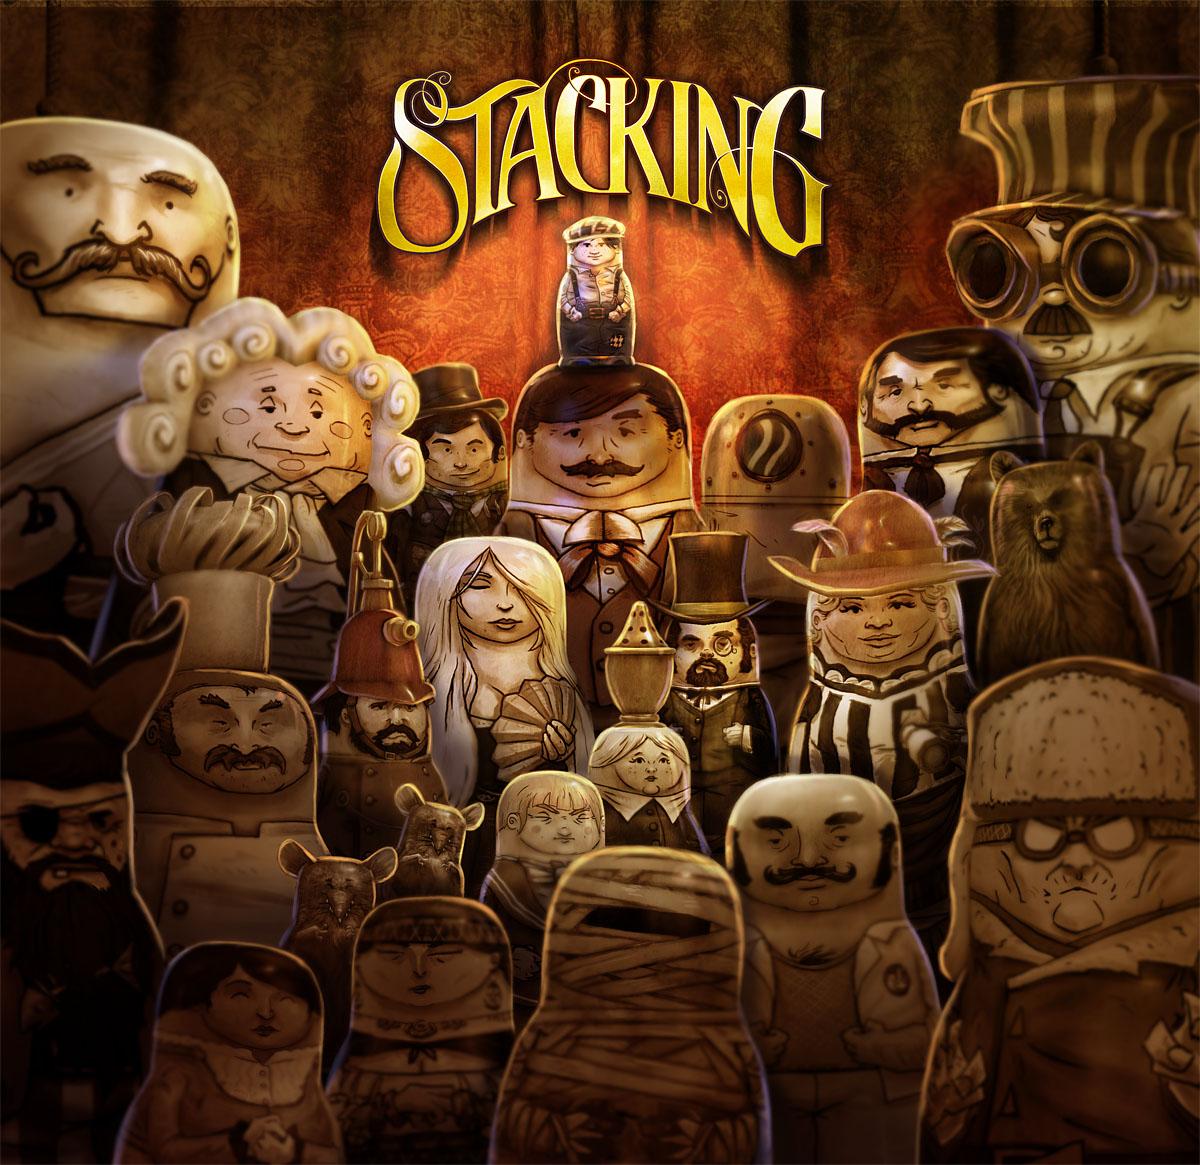 stacking-videogame-artwork-tim-schafer-double-fine-downloadable-xbla-psn